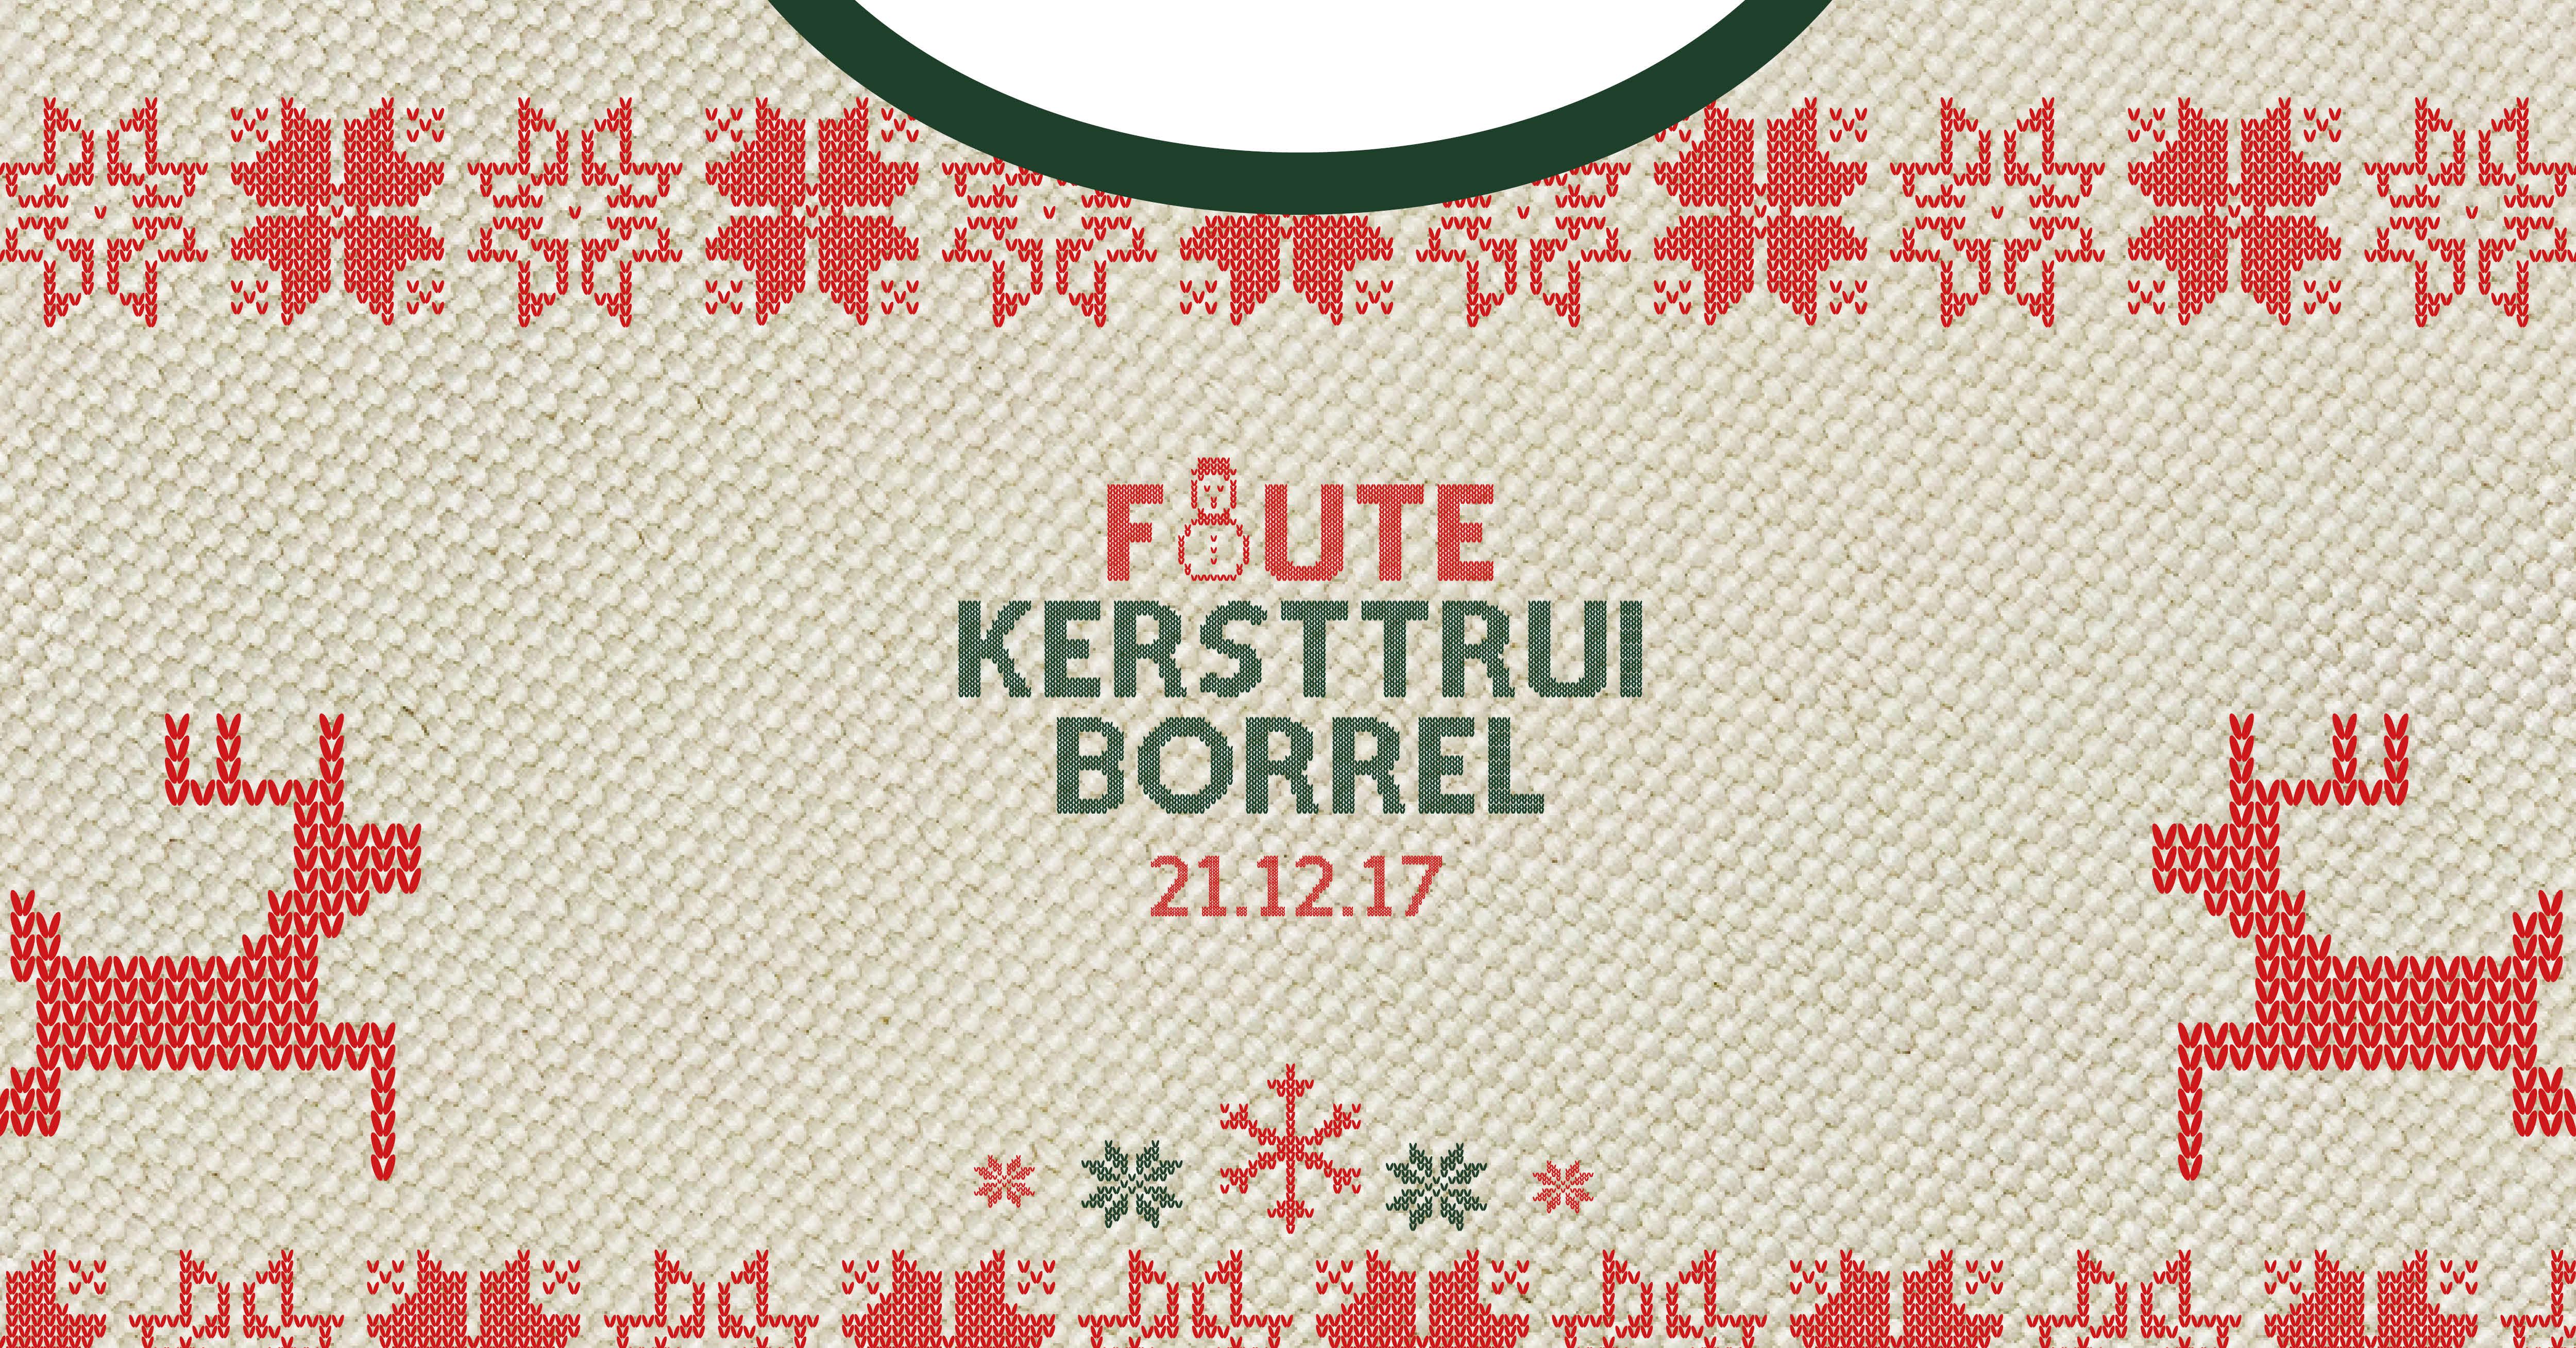 Foute Kersttrui Borrel.Foute Kersttrui Borrel The Basket Utrecht